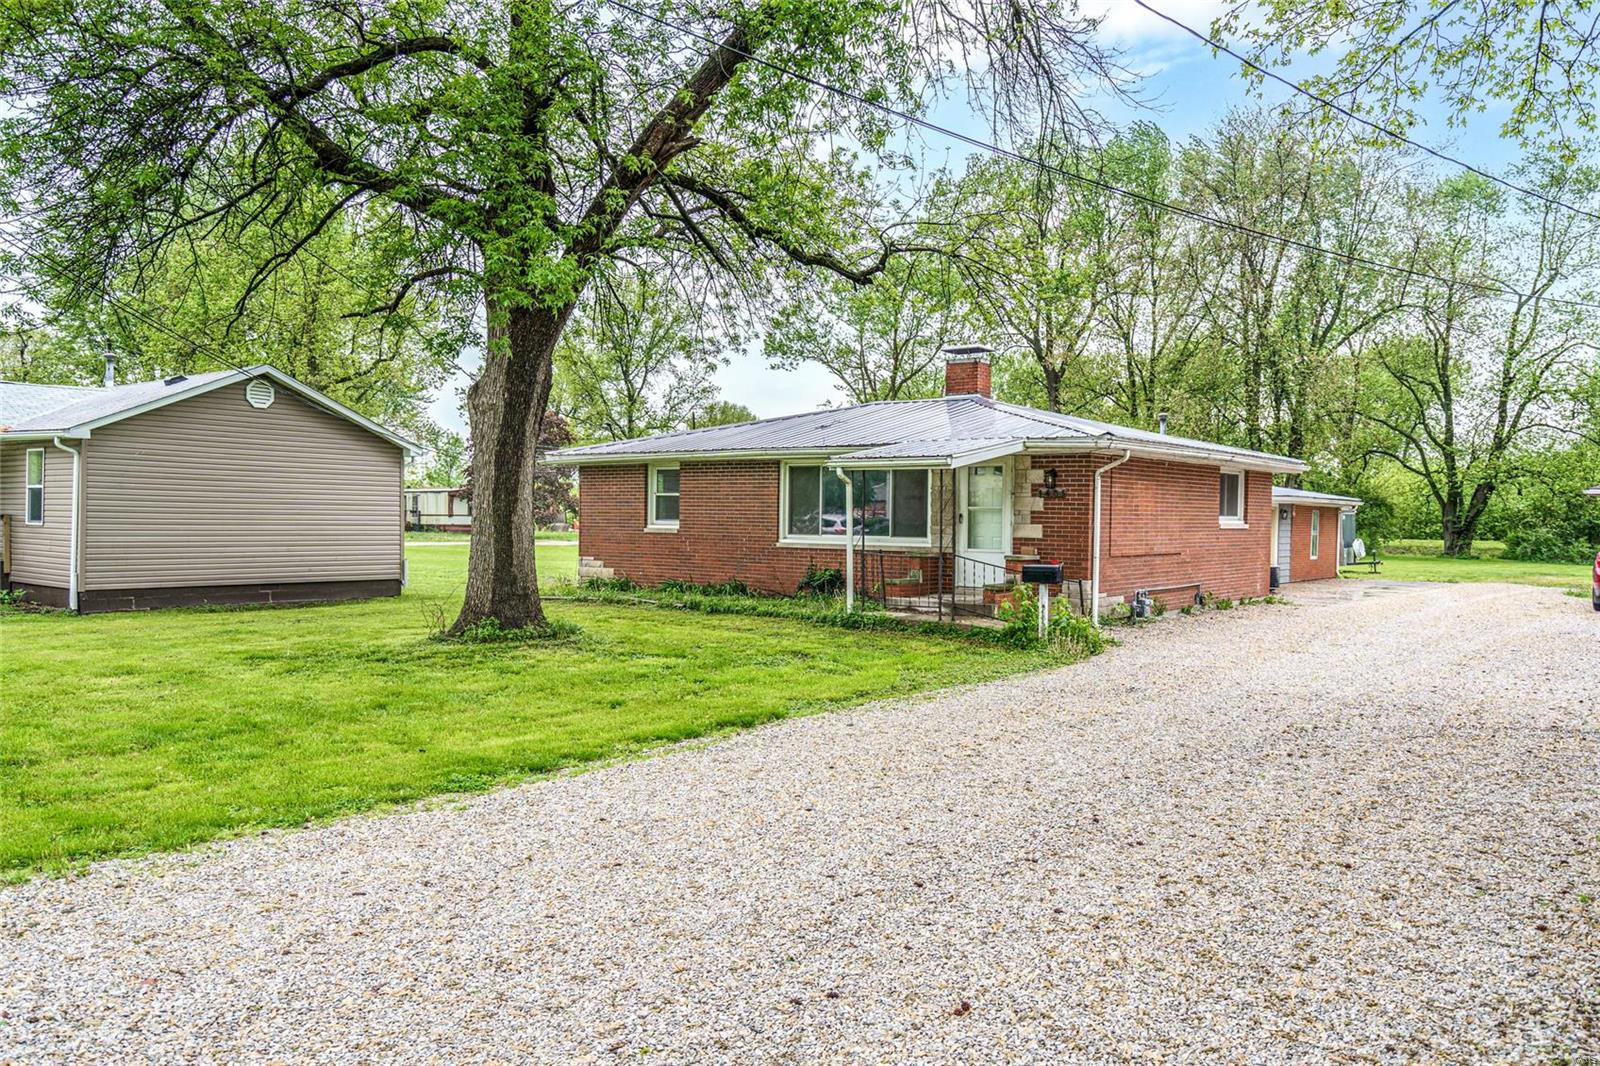 1405 N Jefferson Street Property Photo - Litchfield, IL real estate listing